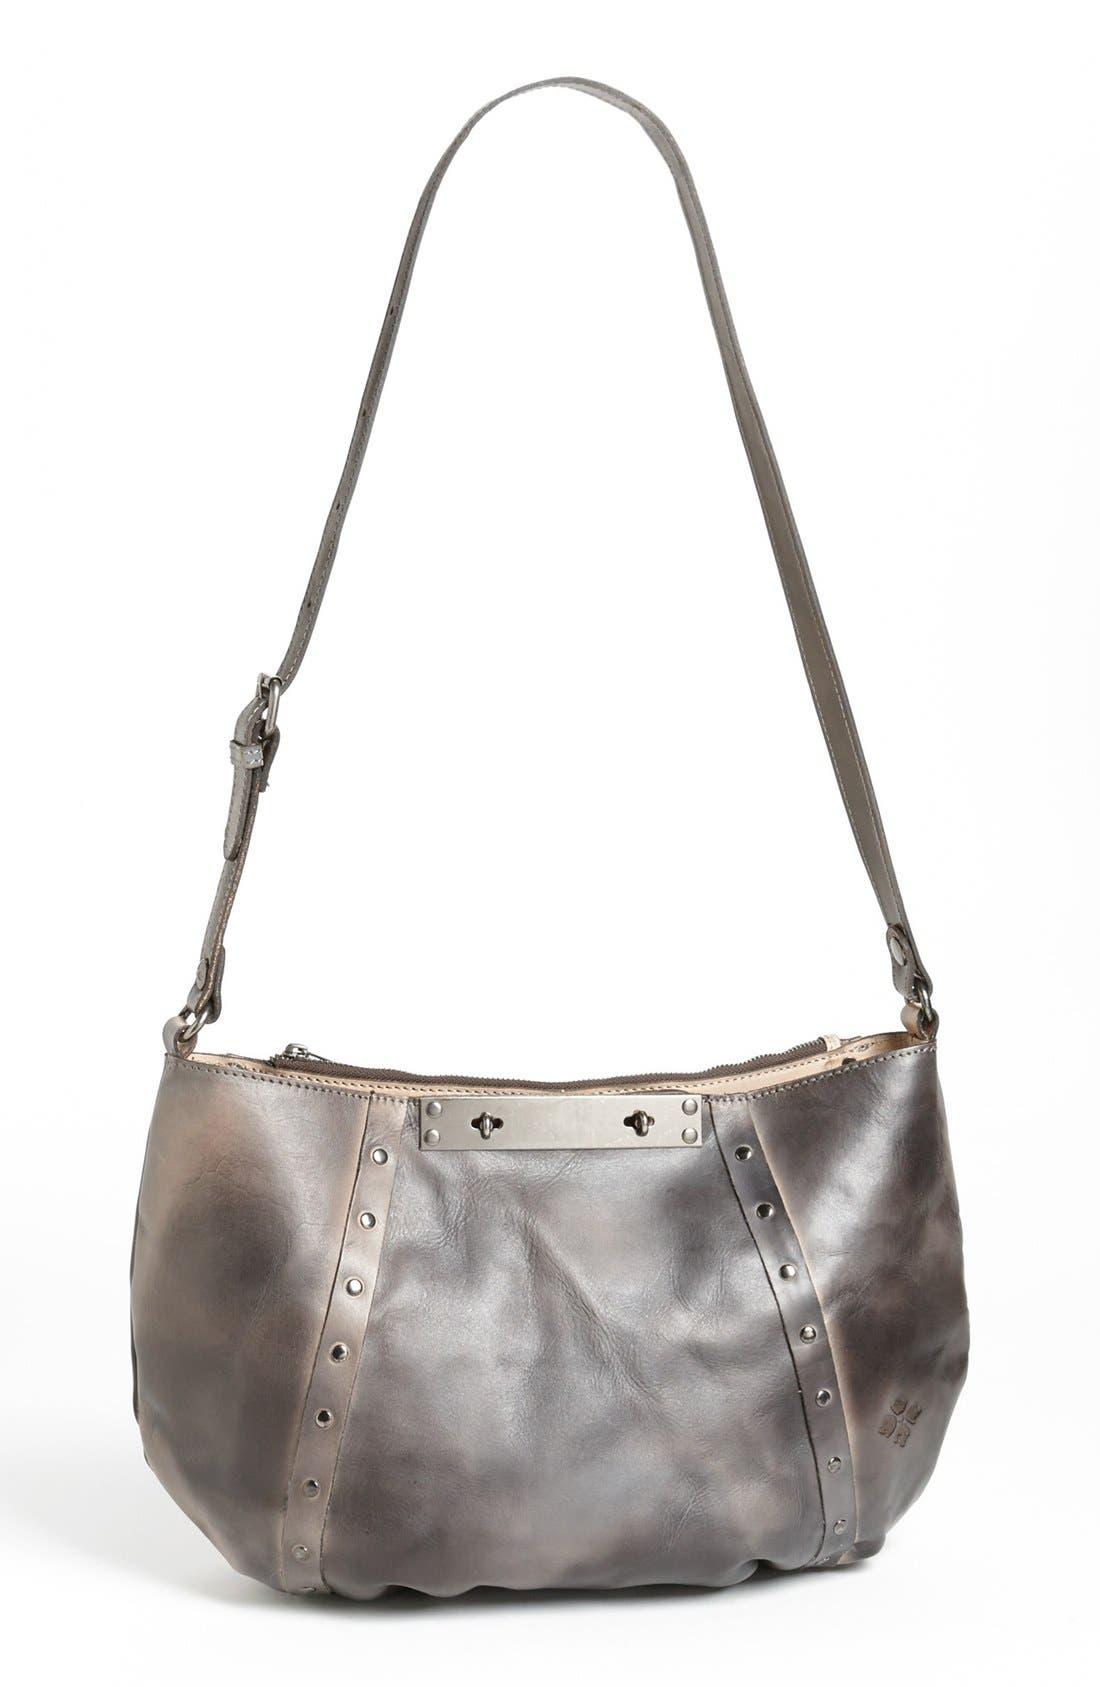 Alternate Image 1 Selected - Patricia Nash 'Bucciano' Leather Shoulder Bag